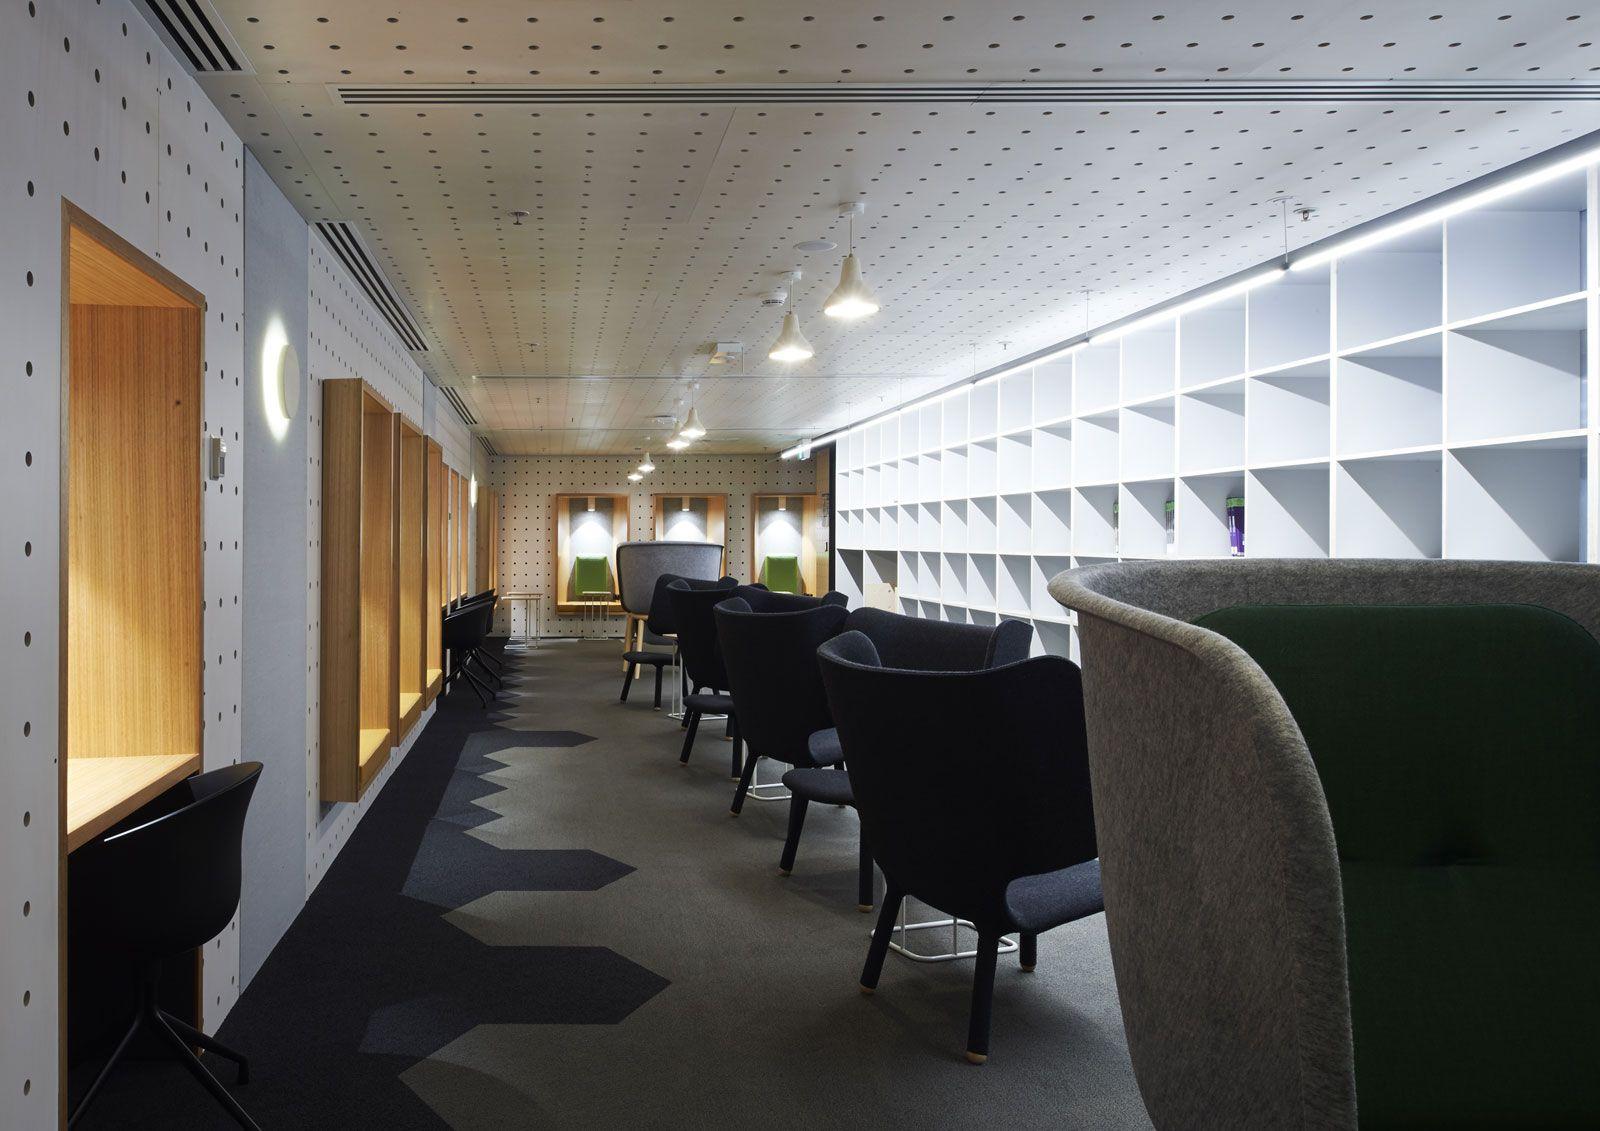 Monash College International Business School by Jackson